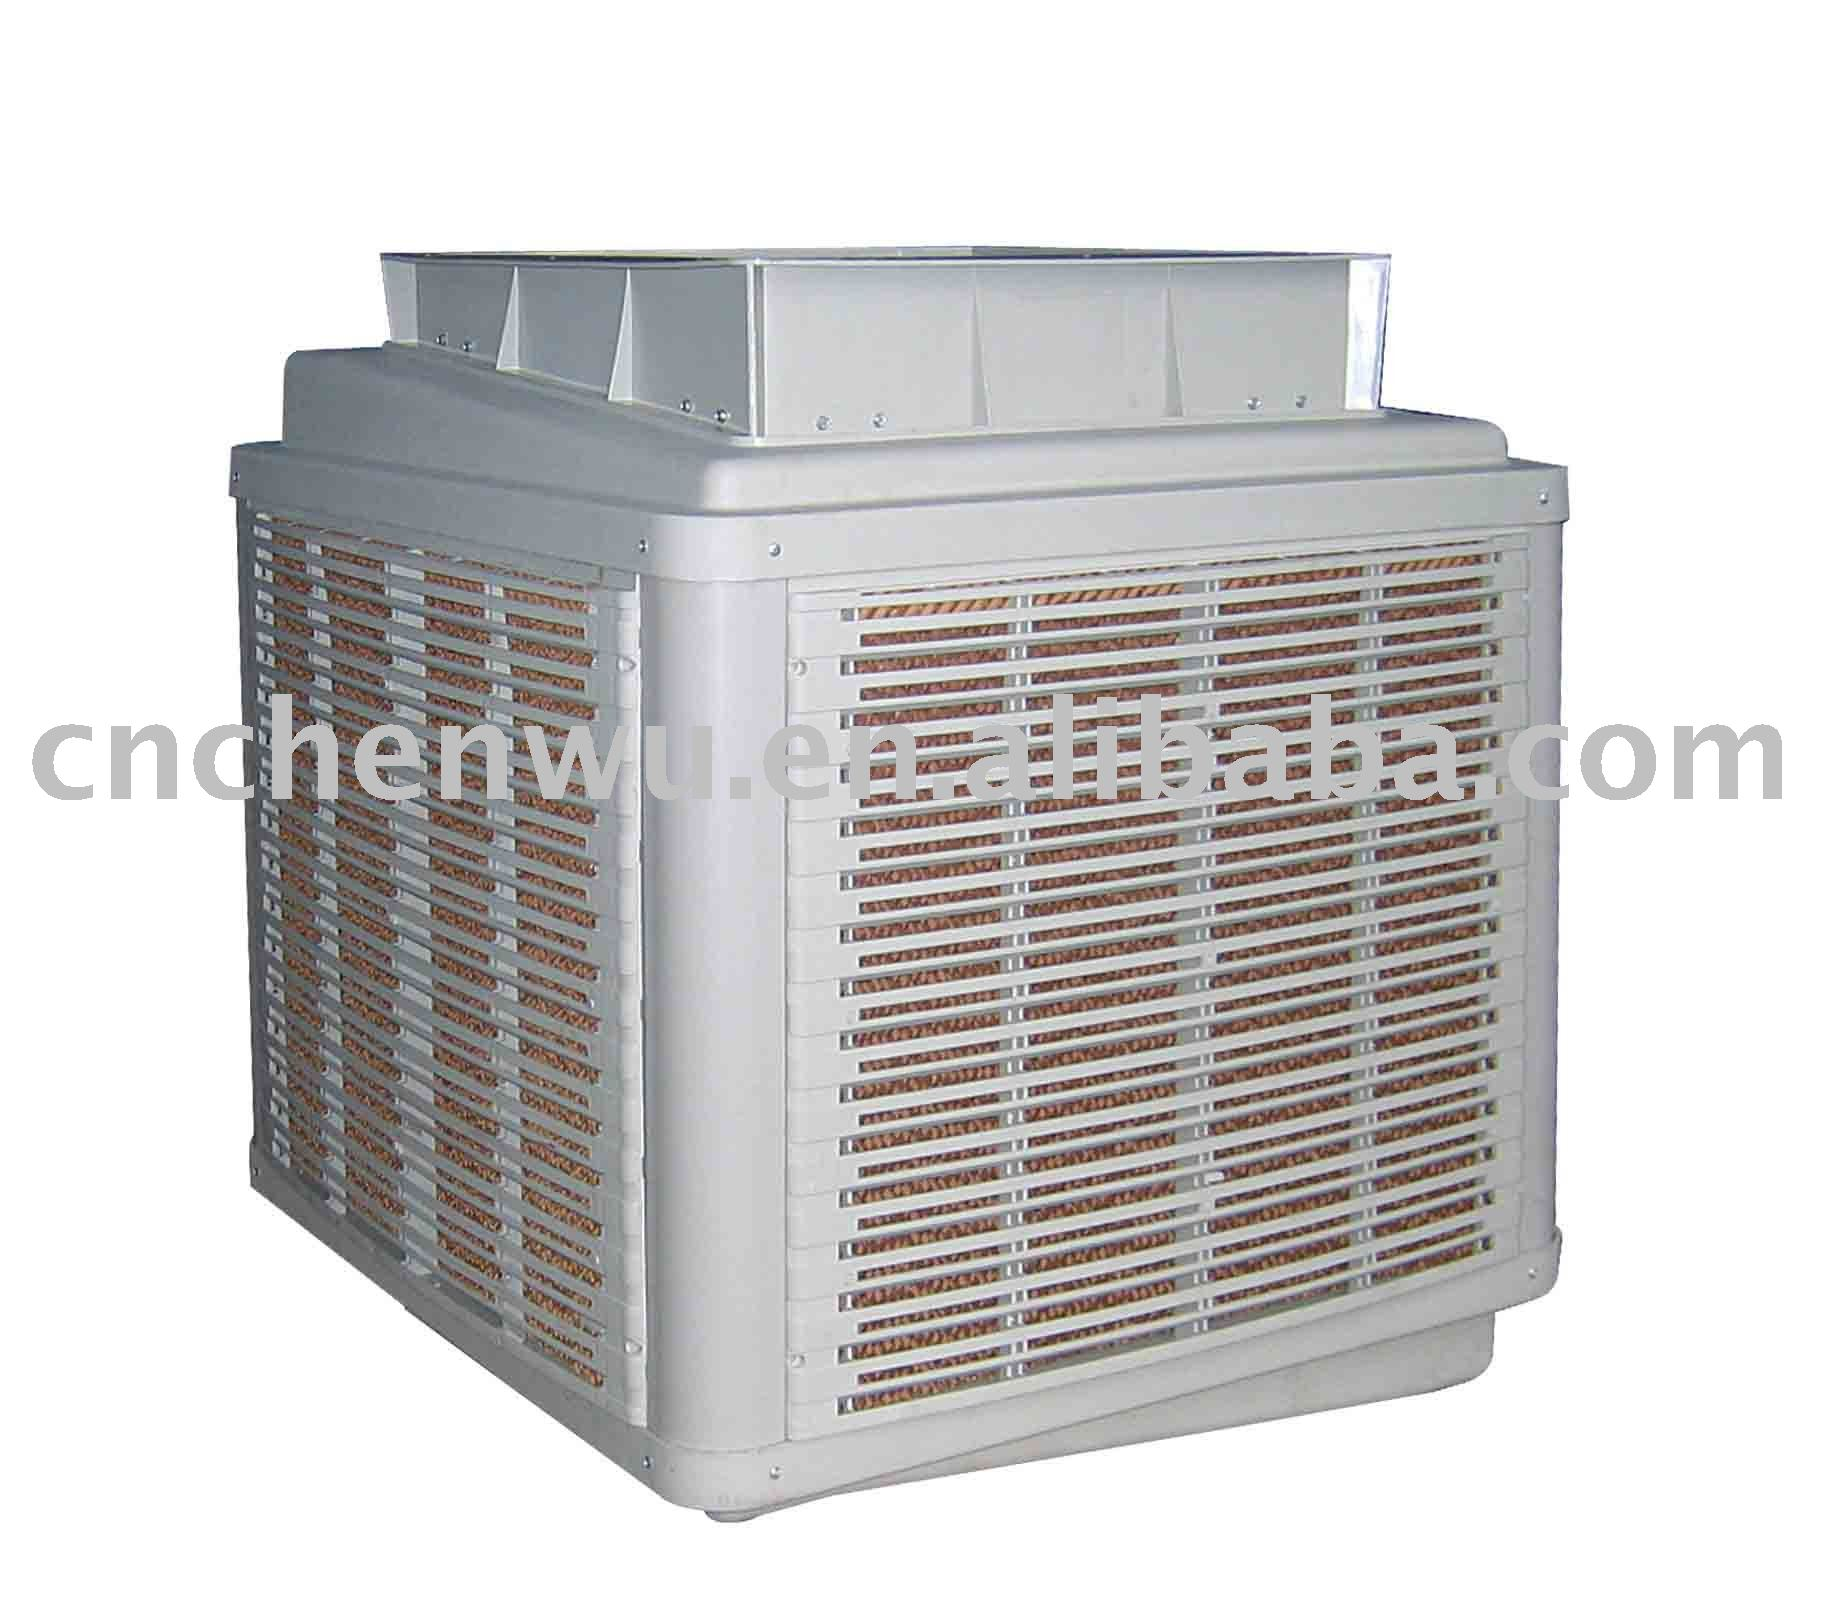 evaporative air cooler evaporative air cooler suppliers and at alibabacom - Evaporative Air Cooler